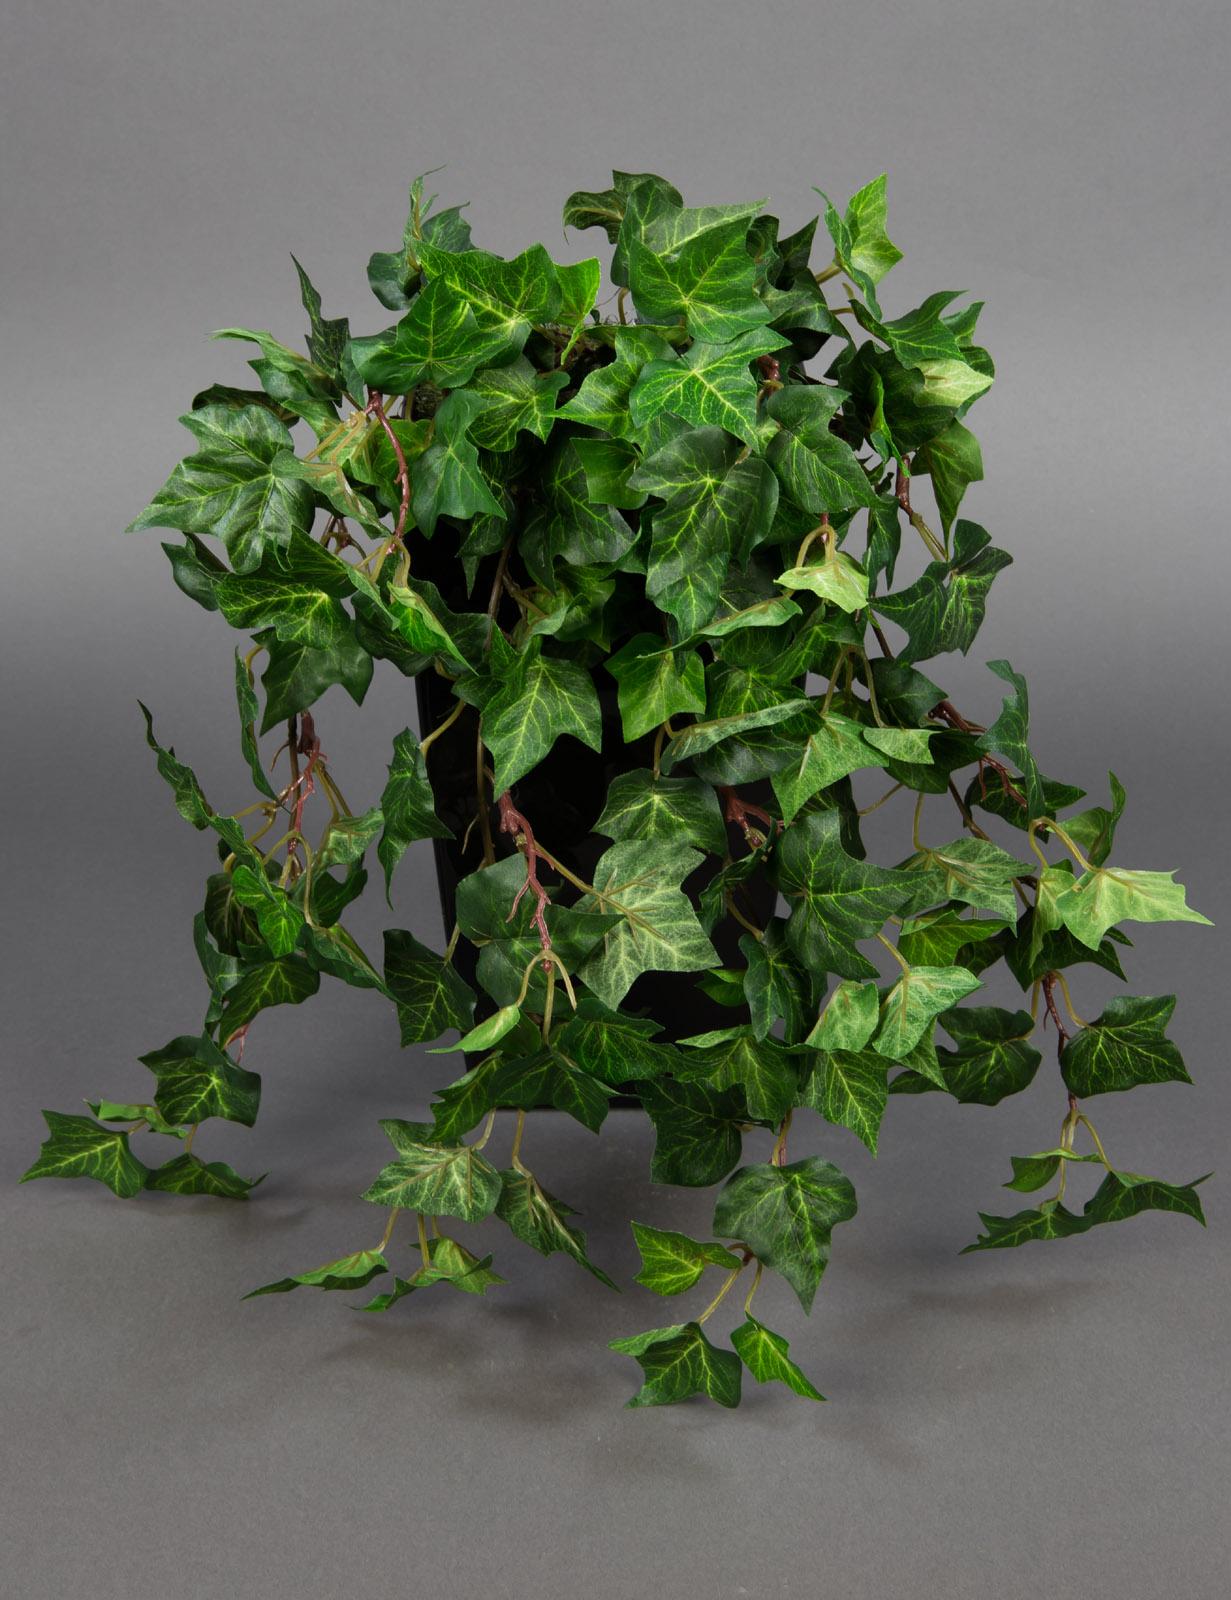 waldefeubusch 45cm da k nstliches efeu efeuranke kunstpflanzen efeubusch ebay. Black Bedroom Furniture Sets. Home Design Ideas